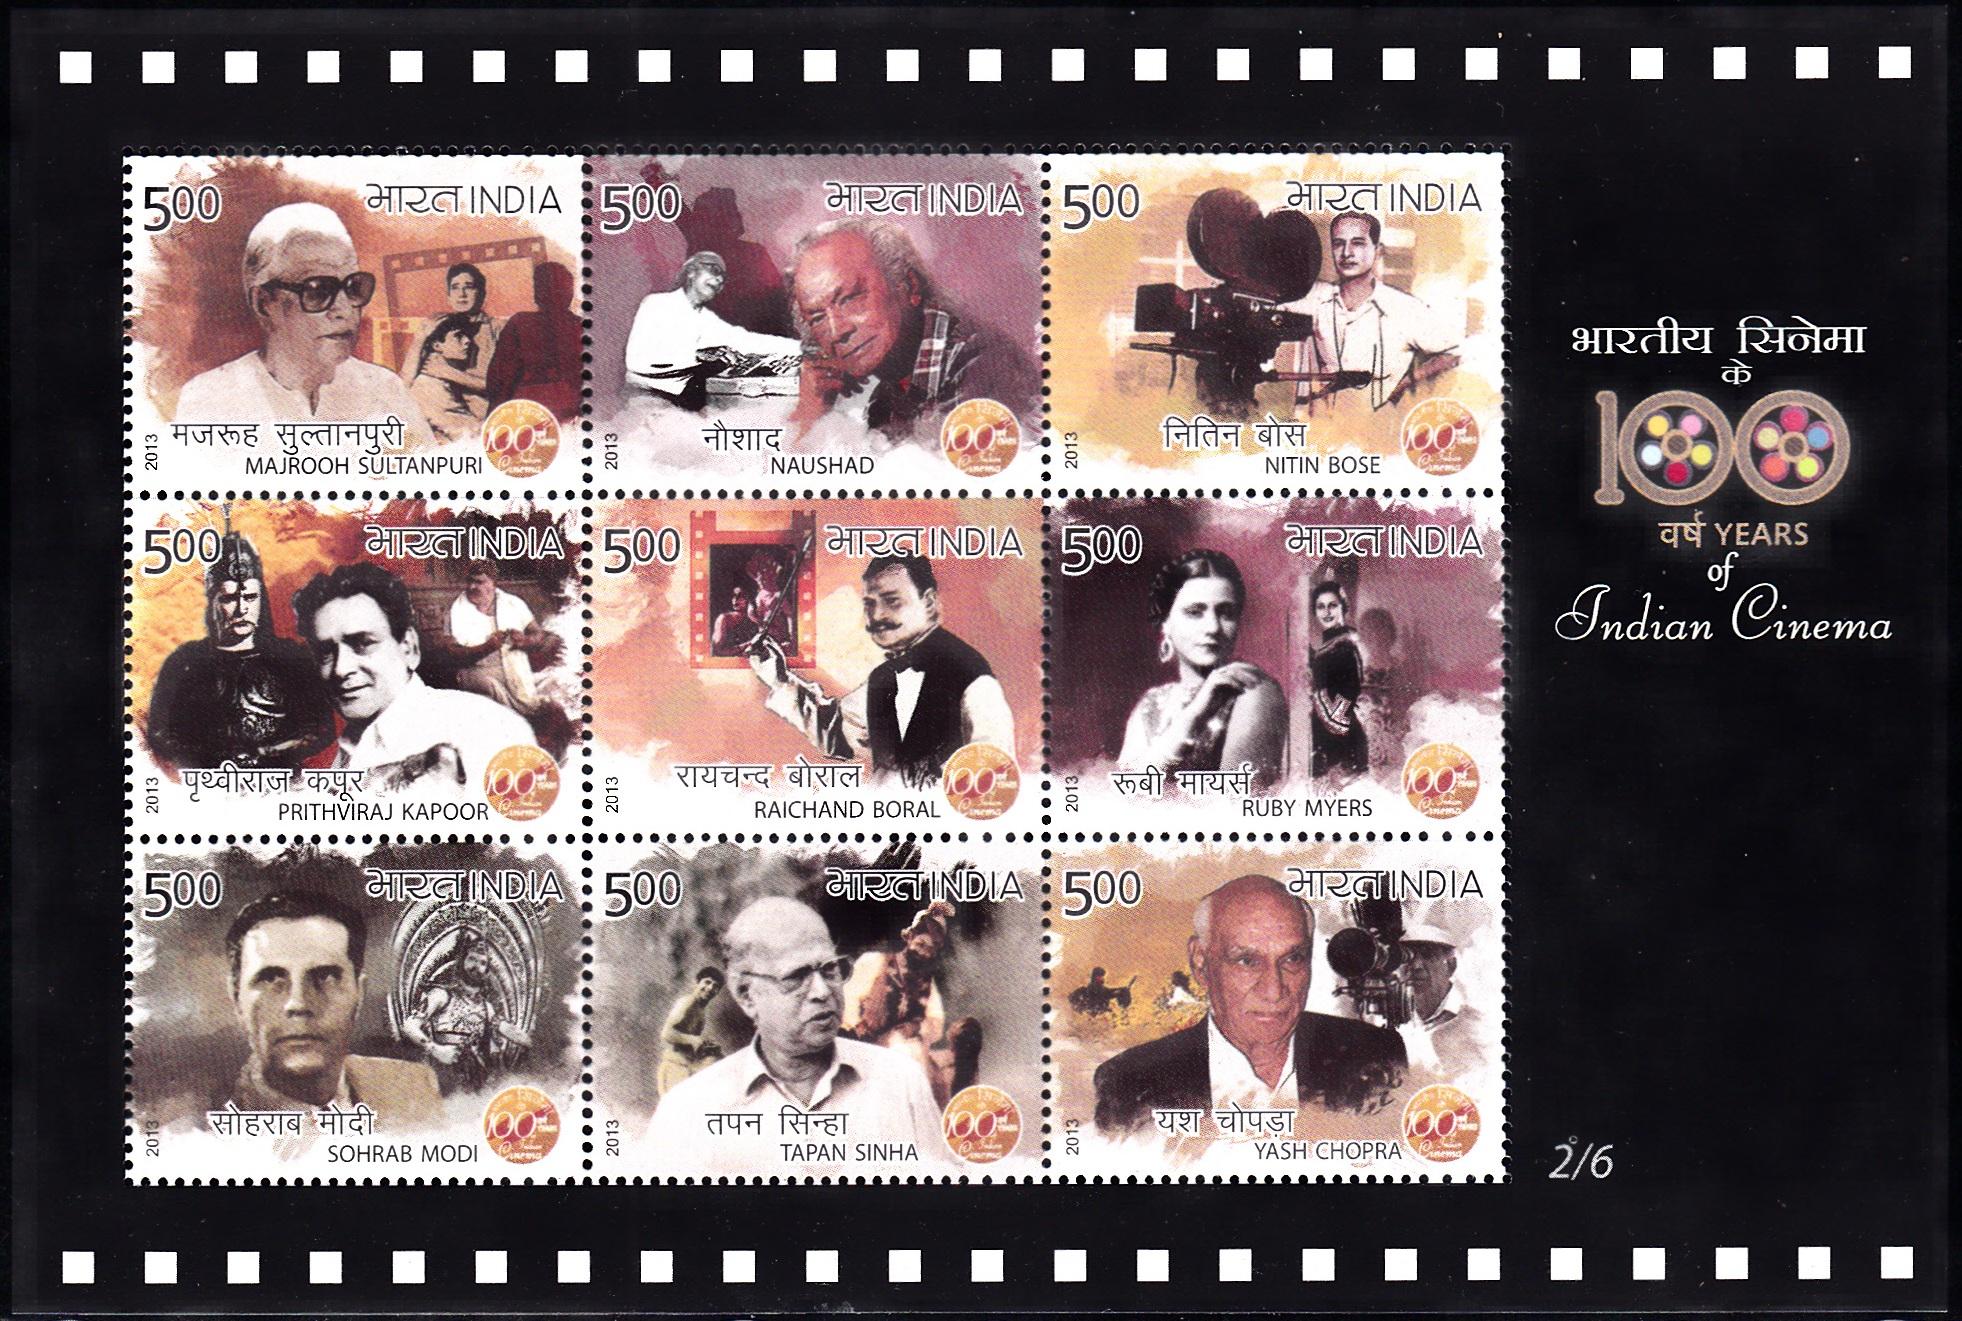 Indian Cinema Centenary : Miniature Sheet 2